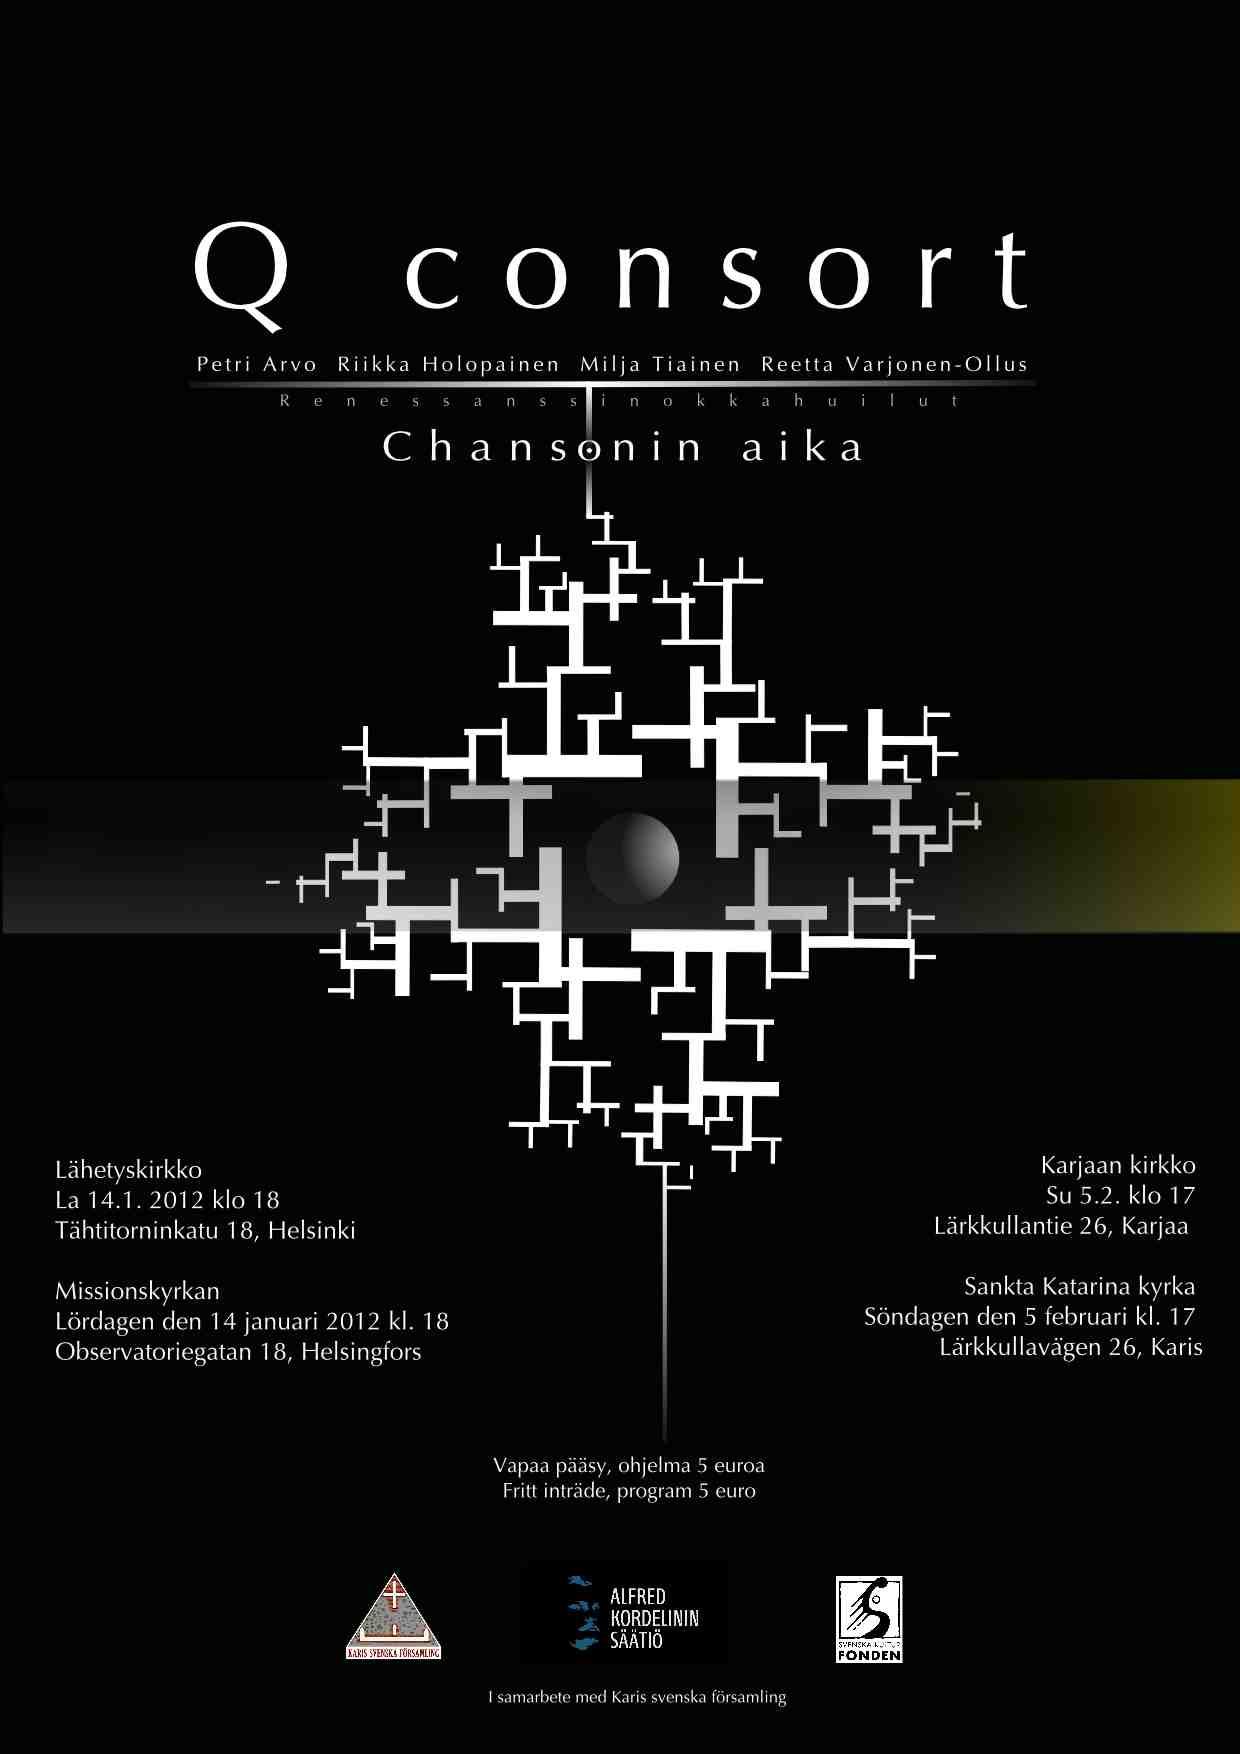 2012 Q consort poster